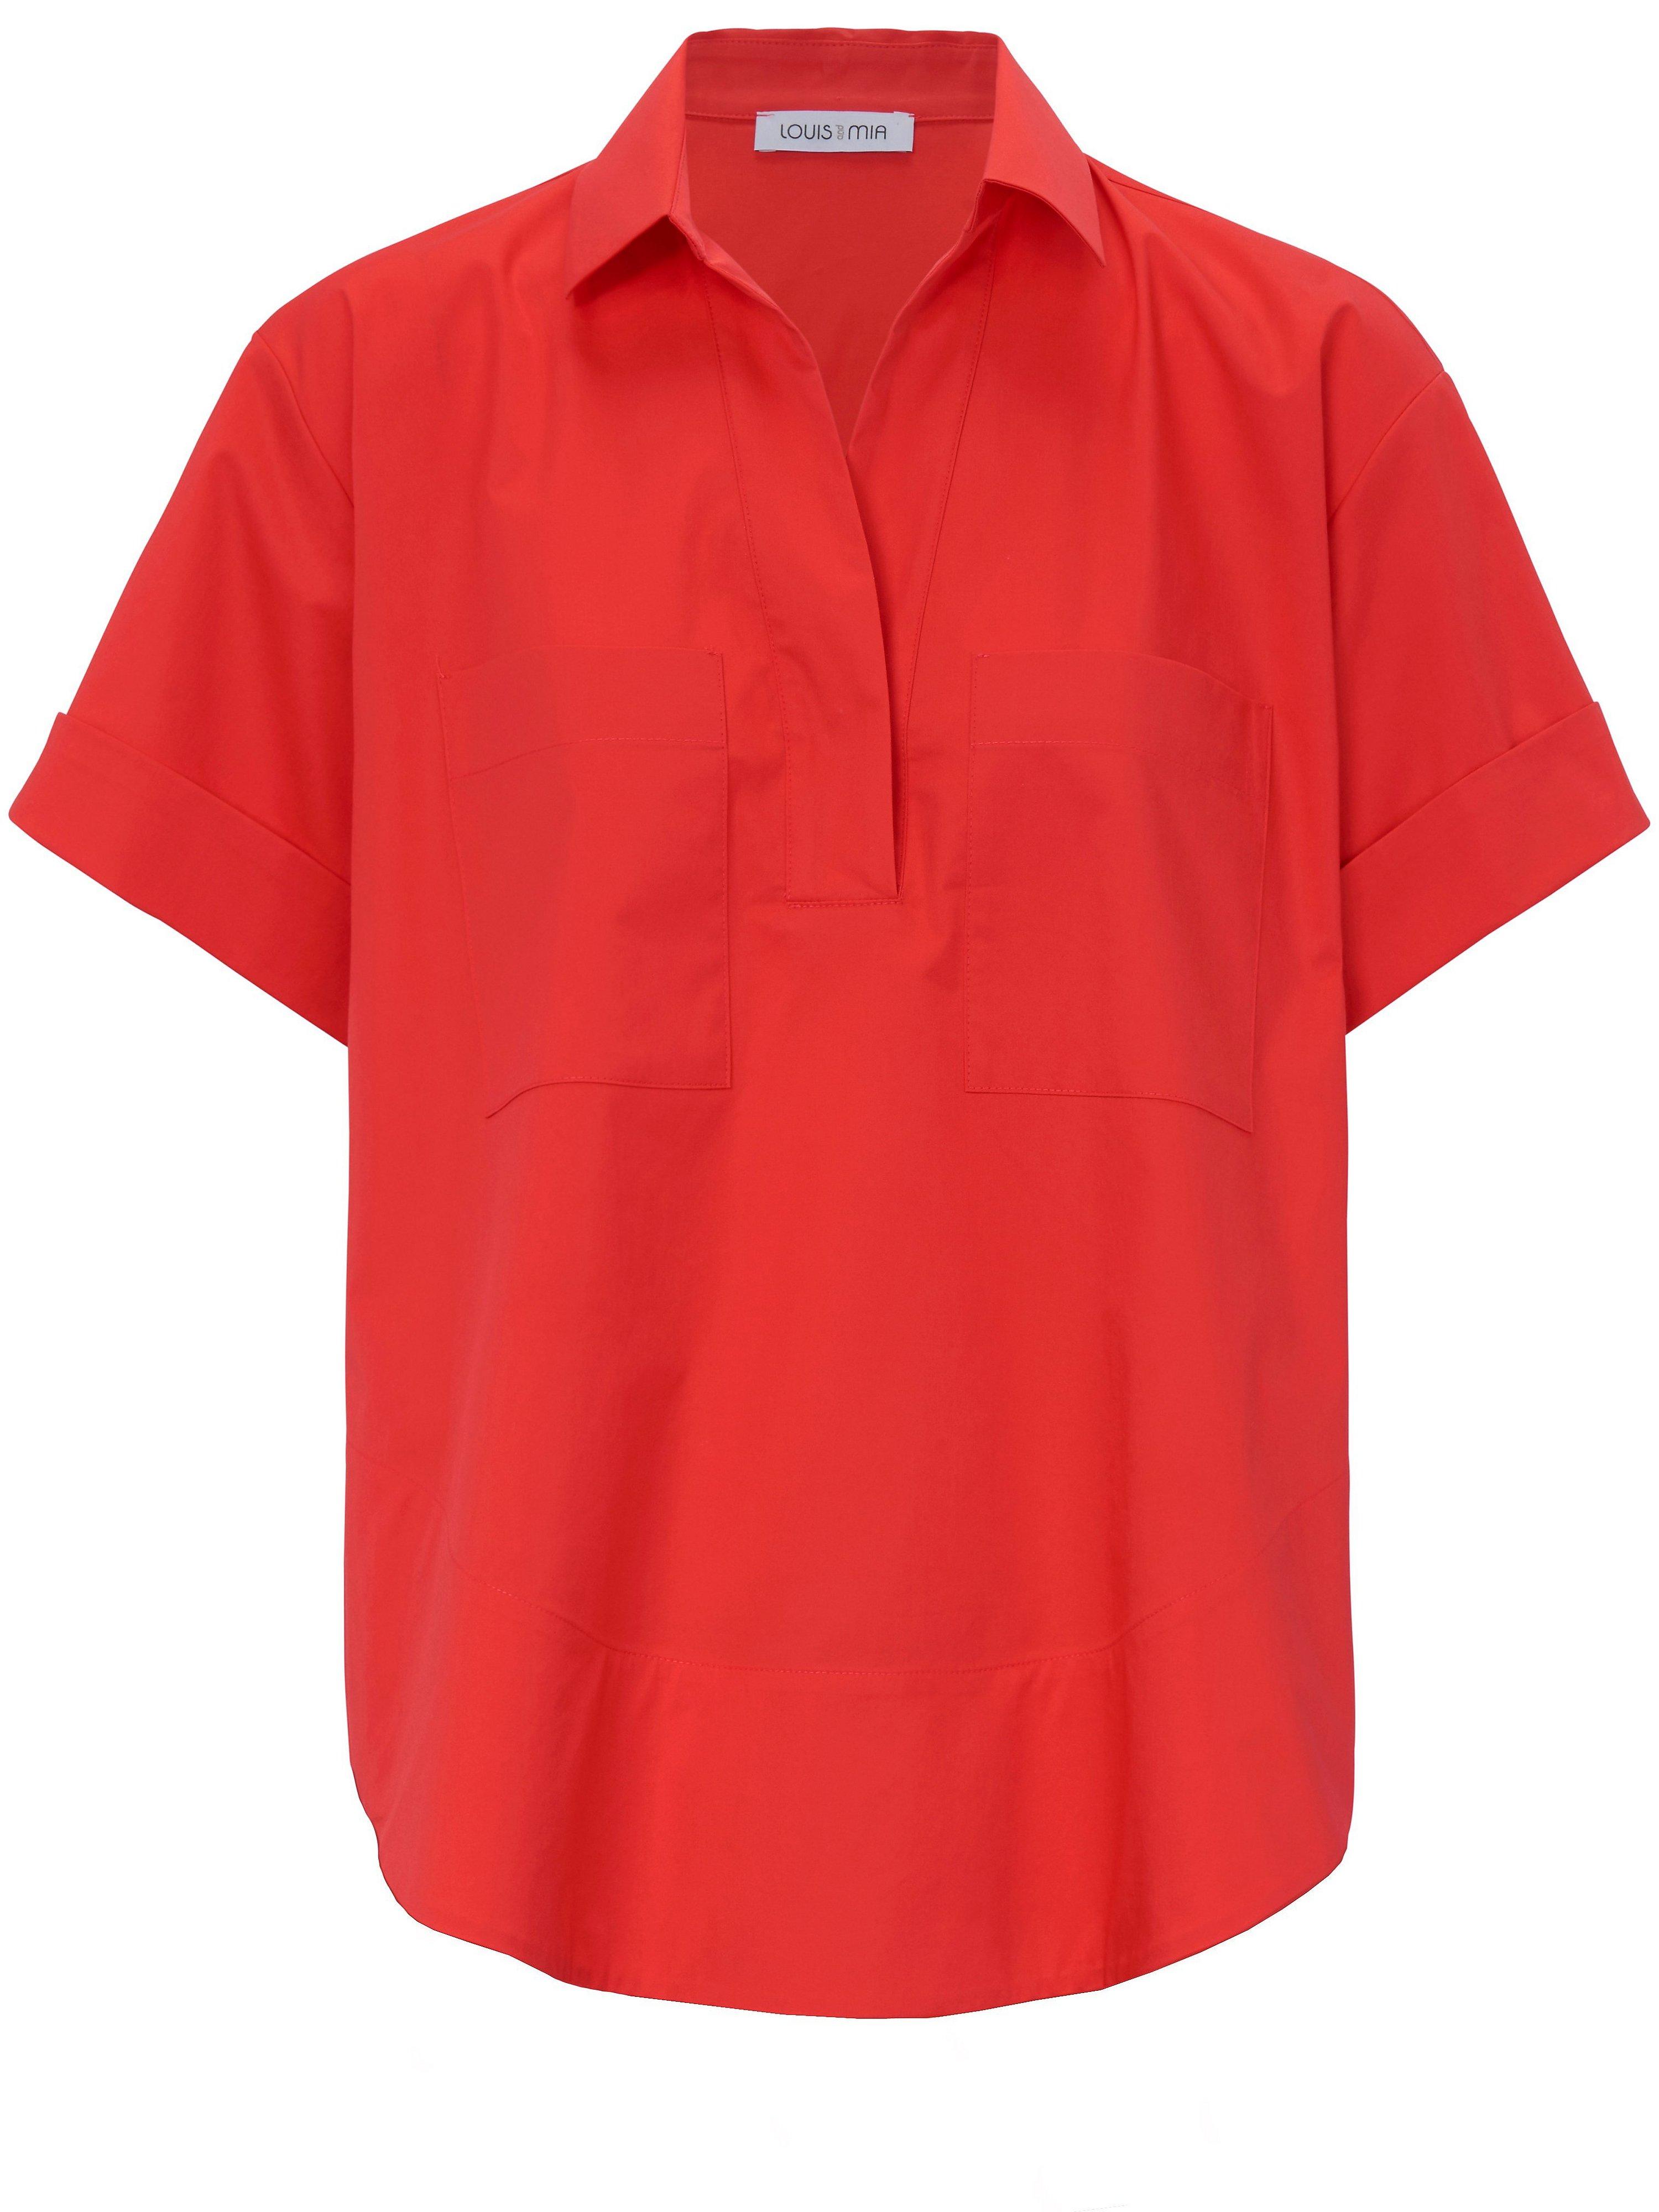 La blouse manches courtes  Louis and Mia rouge taille 40